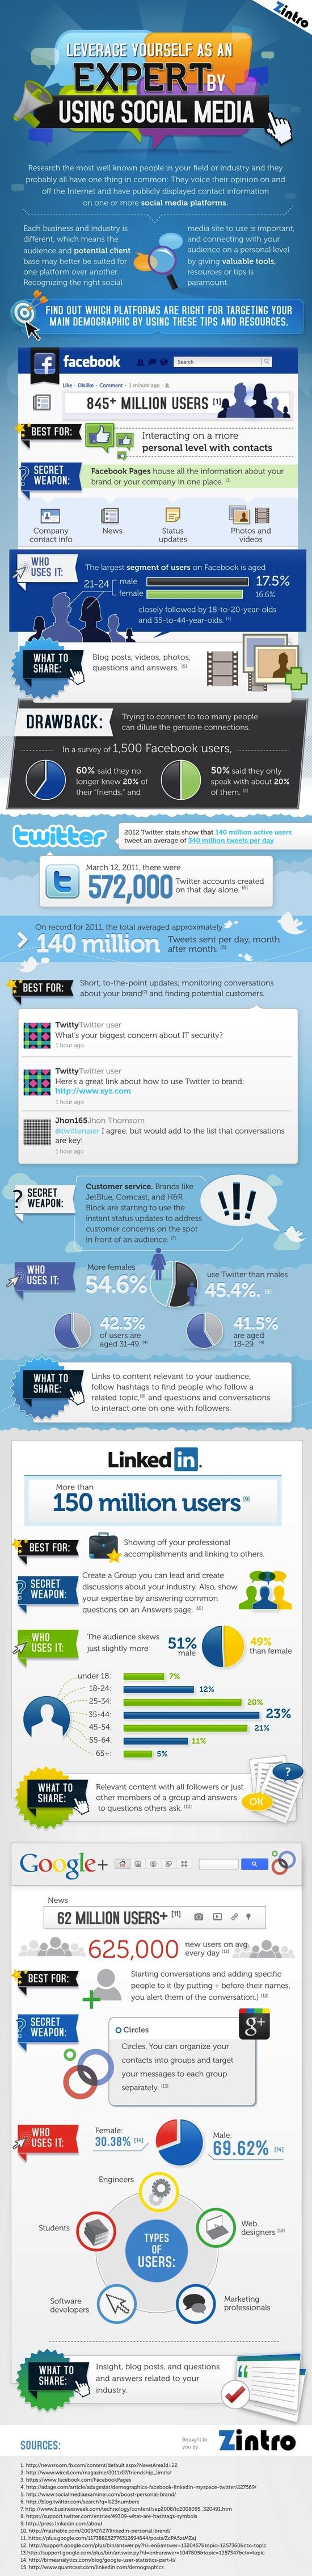 infographic social media 2013